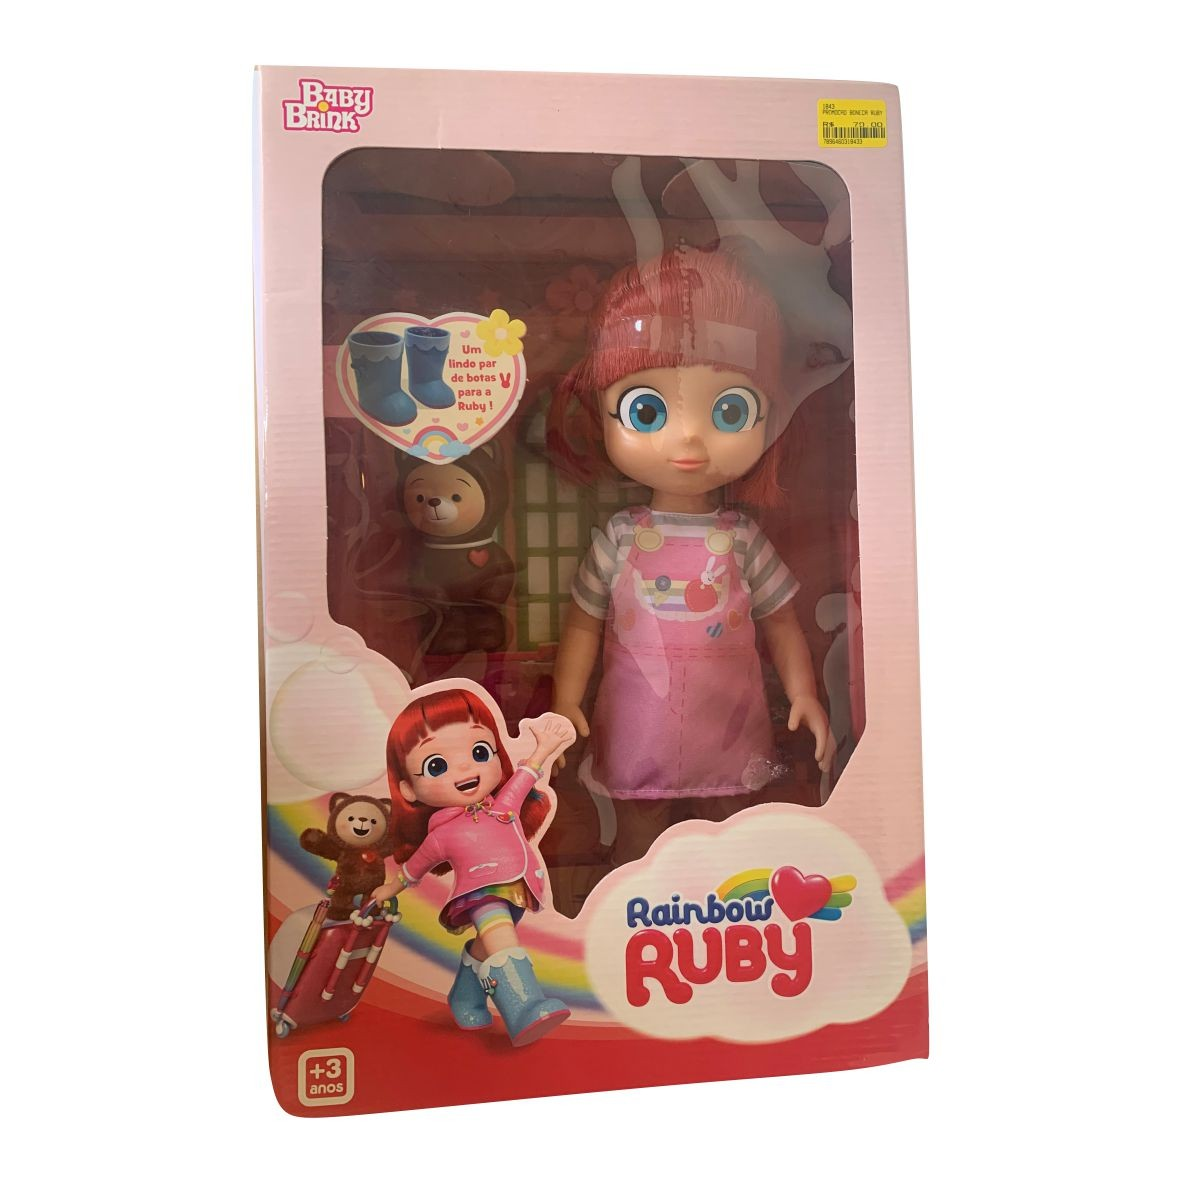 Boneca Rainbow Ruby e Choco